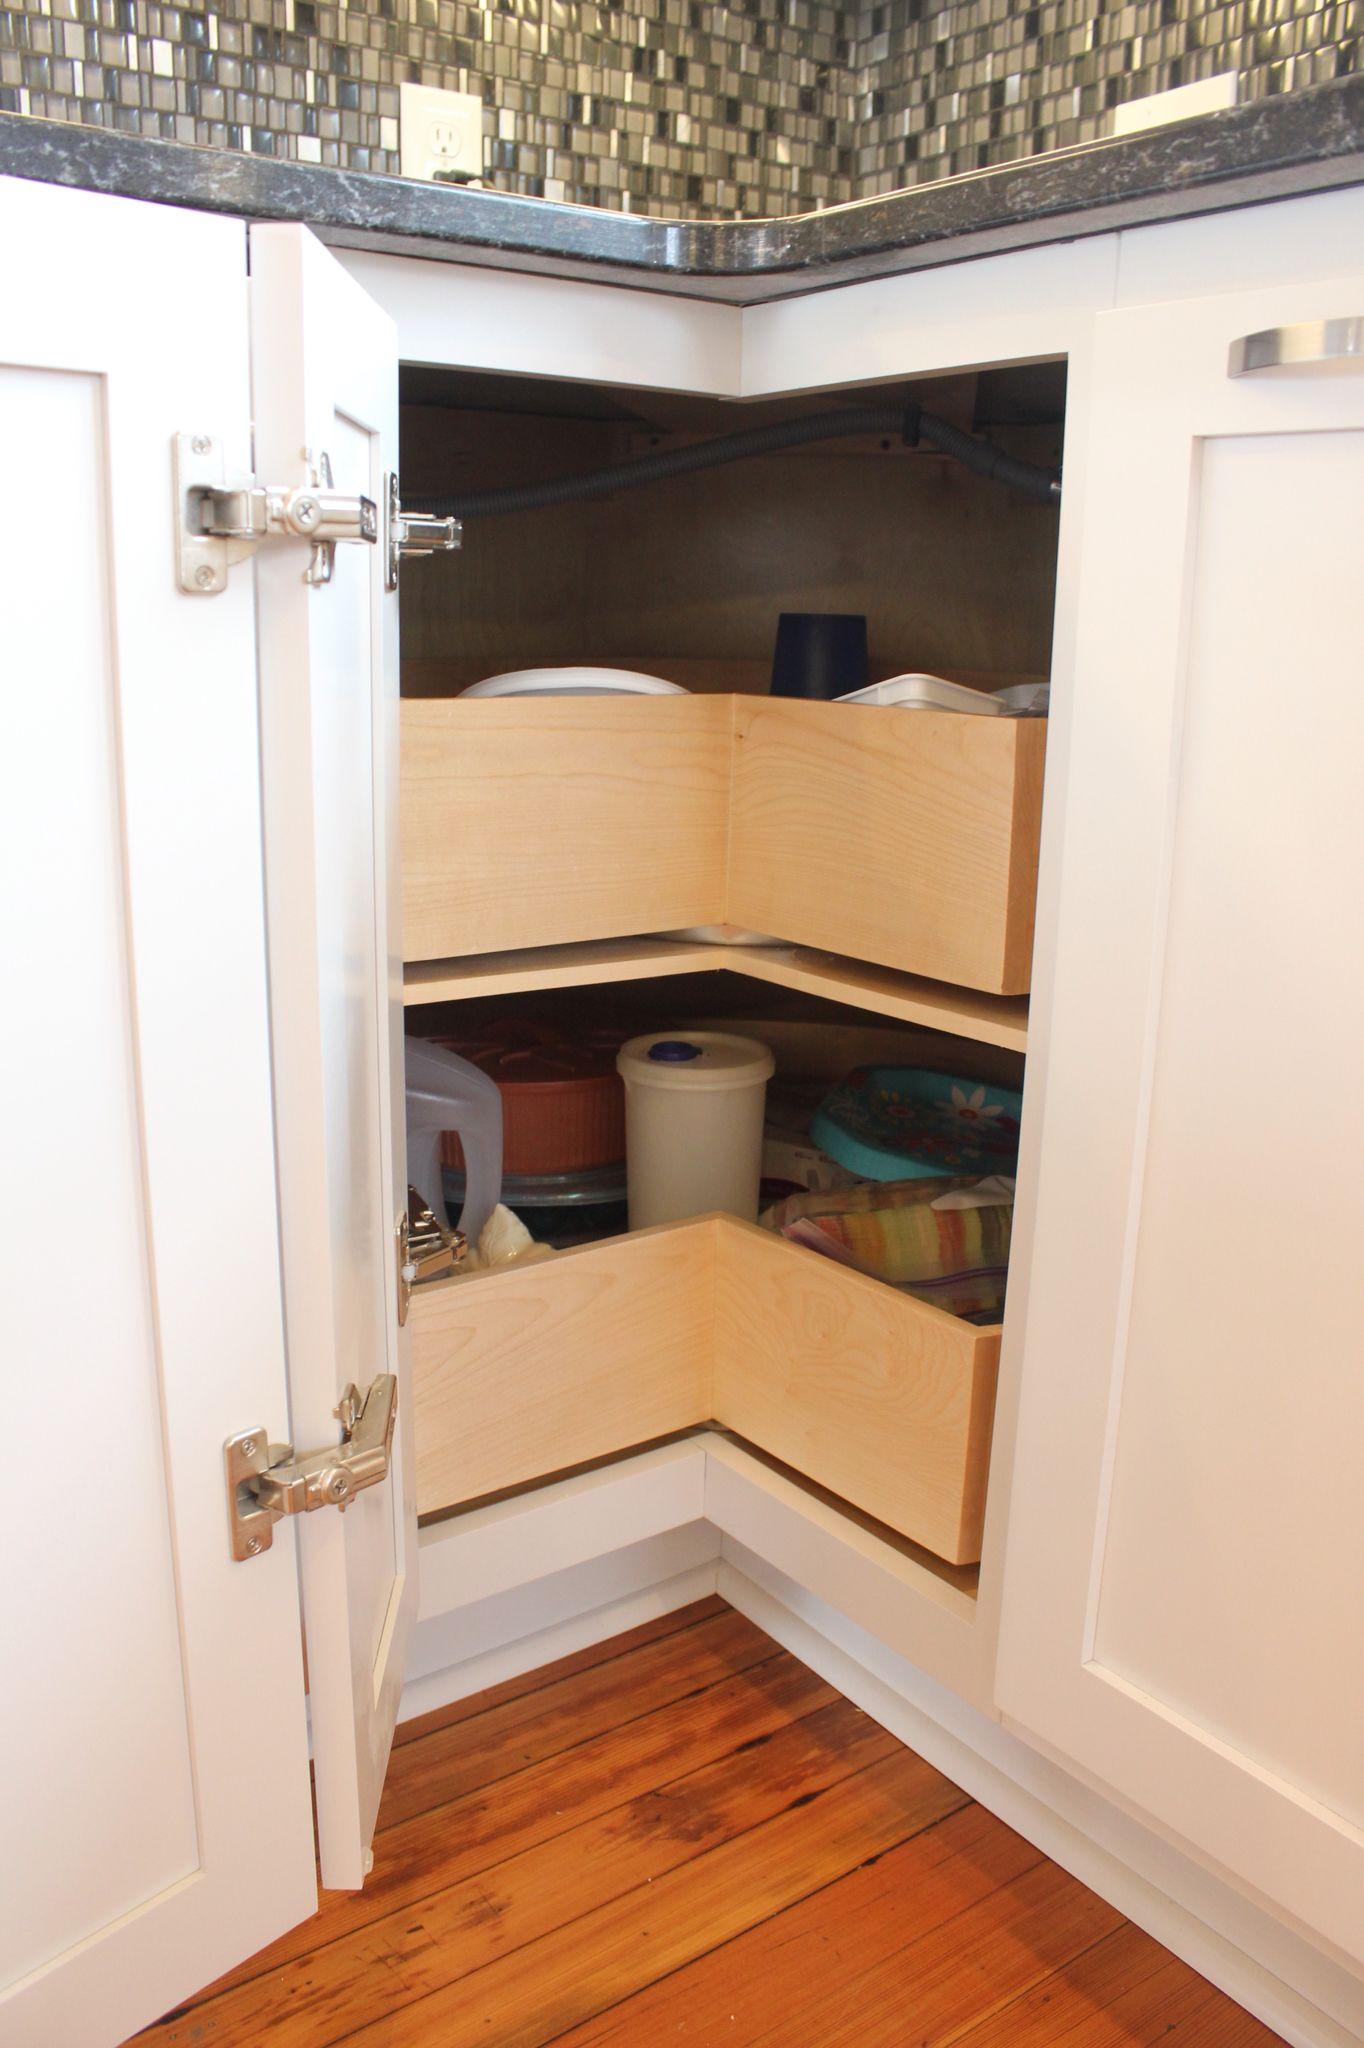 lazy susan kitchen cabinet cabinet kitchen cabinets on kitchen organization lazy susan id=94485